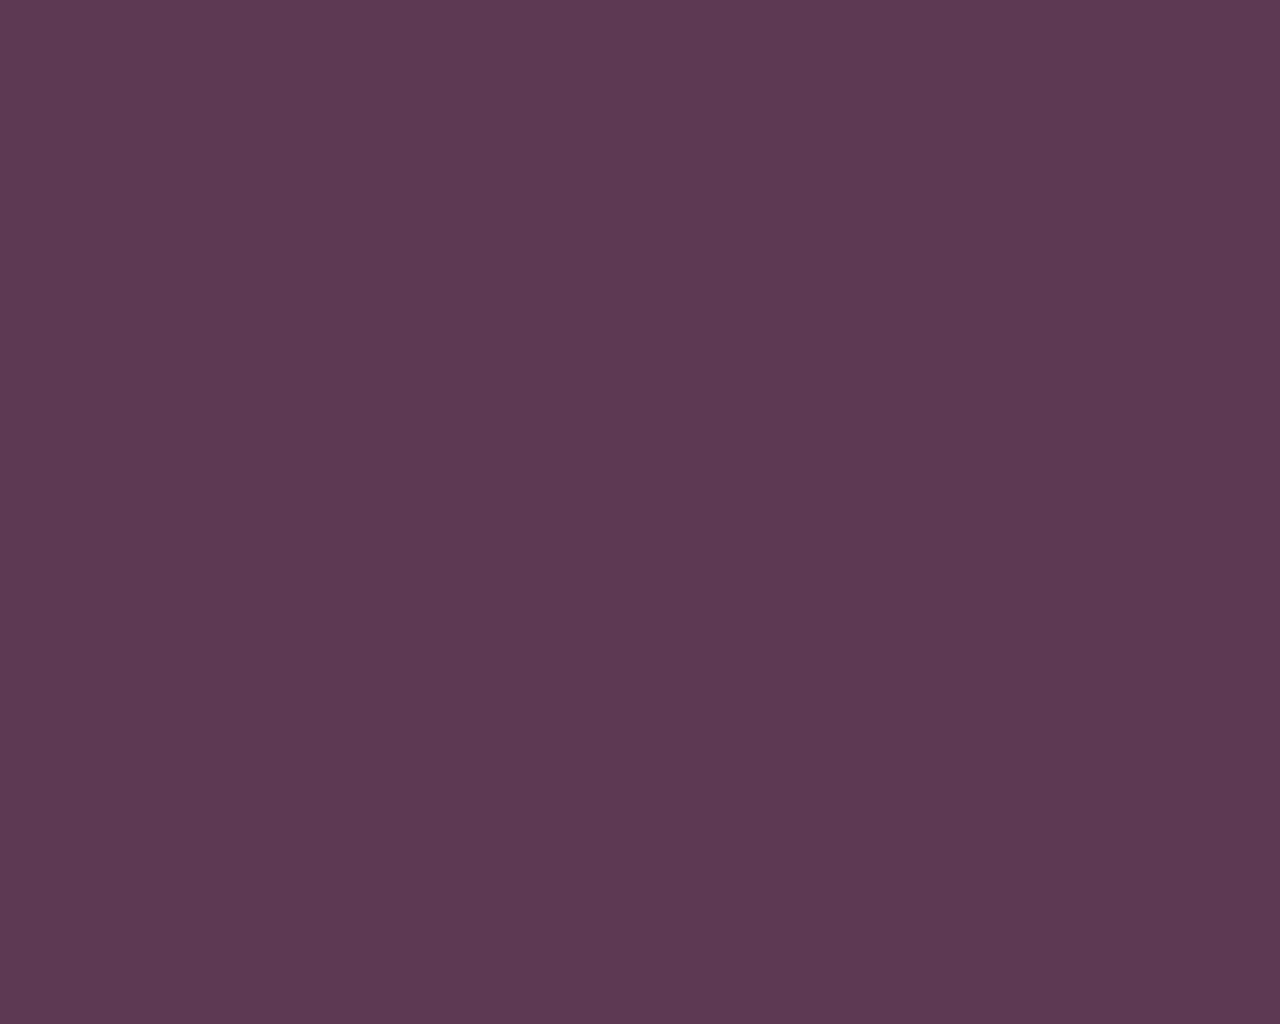 1280x1024 Dark Byzantium Solid Color Background